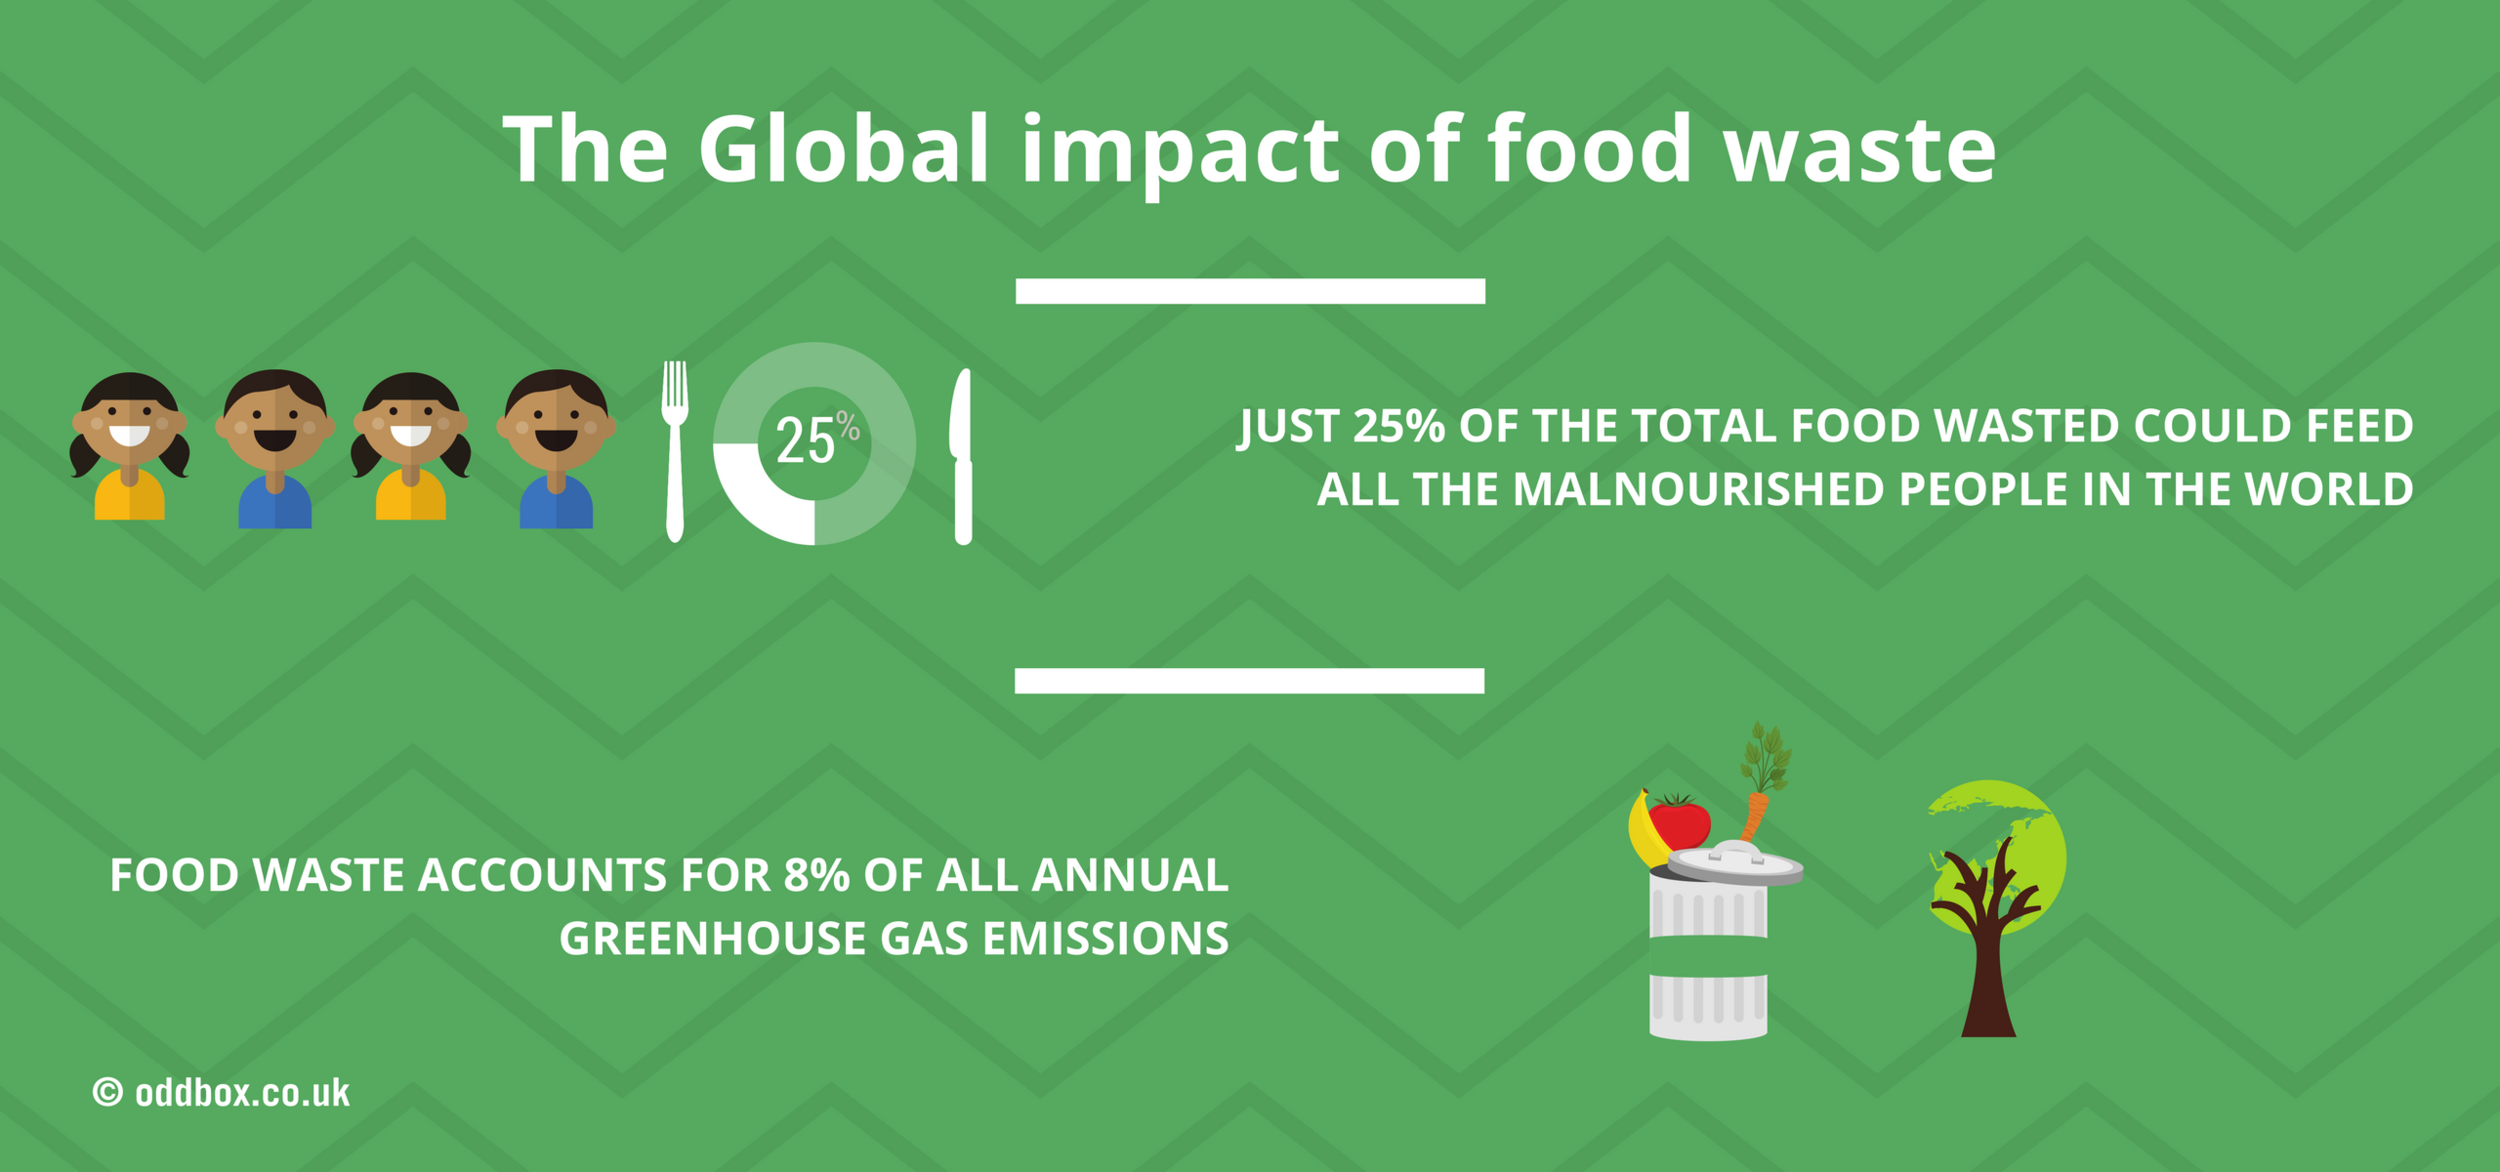 GLOBAL IMPACT OF FOOD WASTE_website_image.png